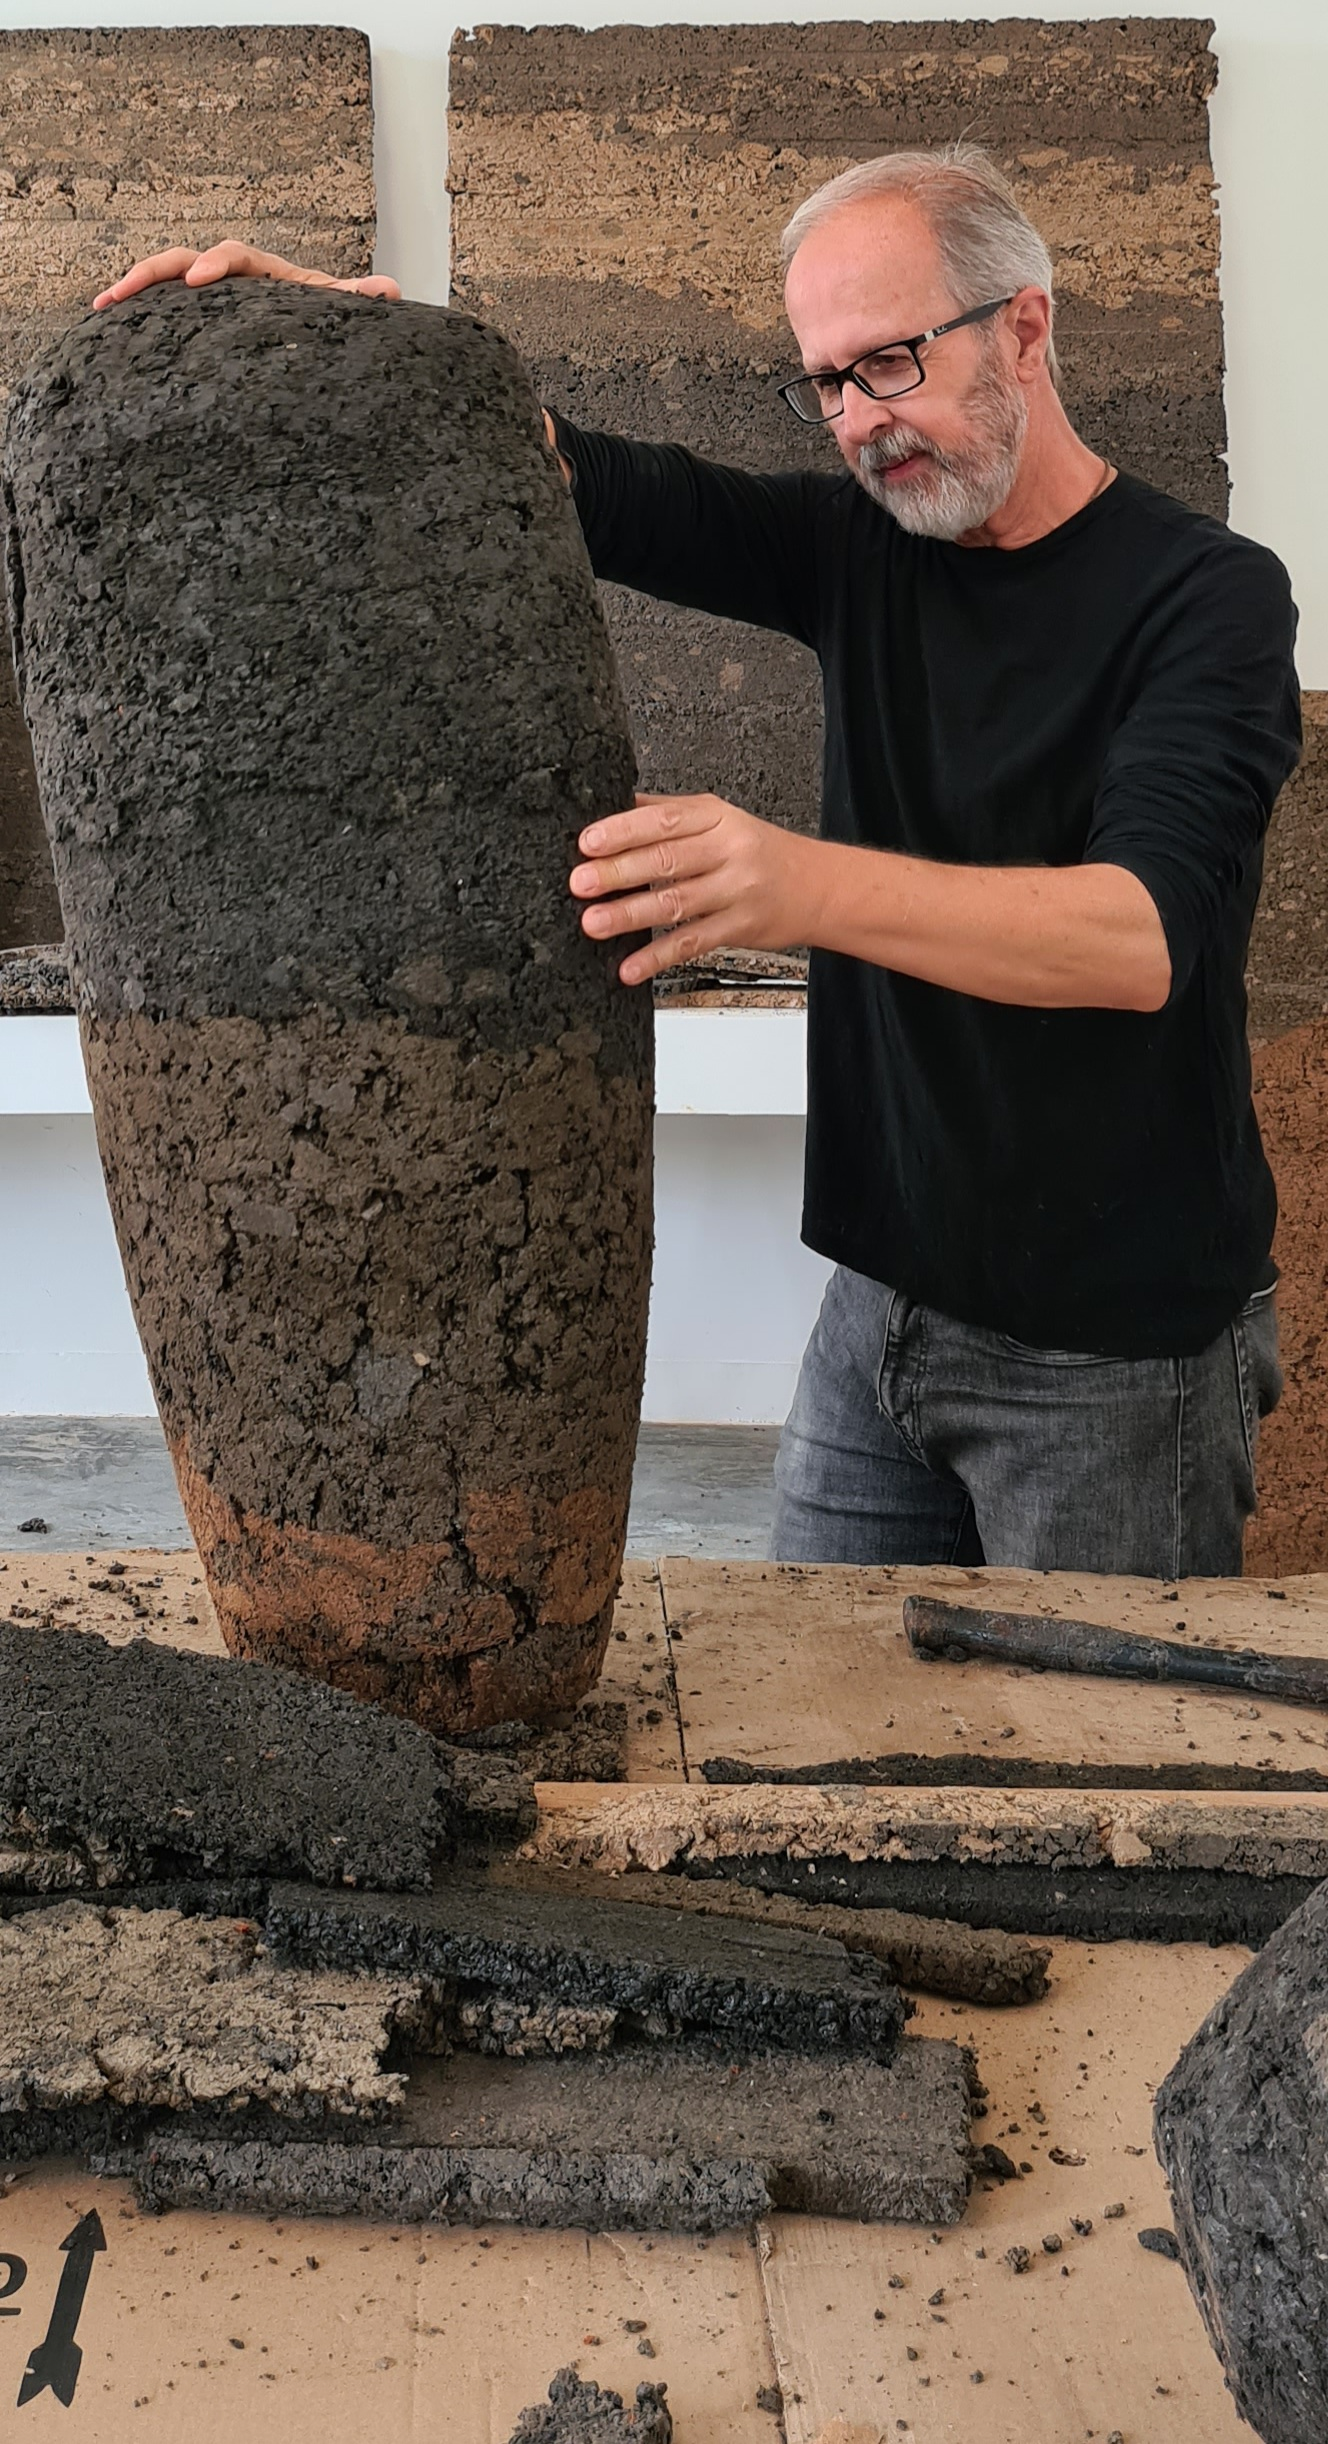 The Idea of Sustainable Reuse by Domingos Tótora